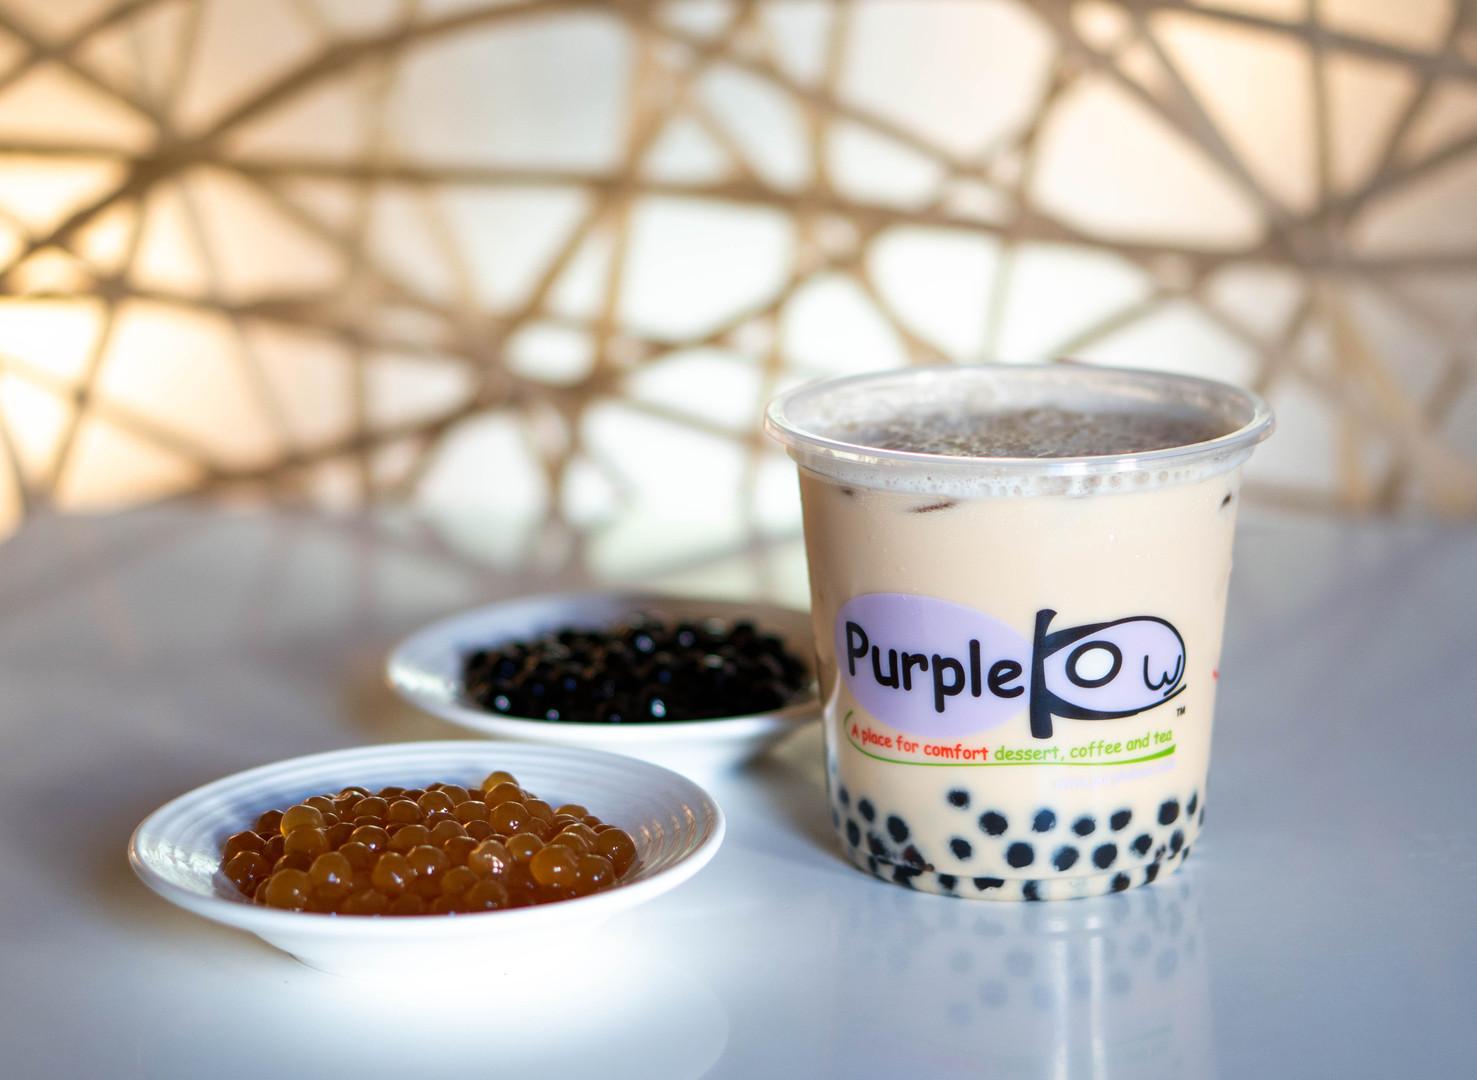 B1 Purple Kow Milk Tea with Boba